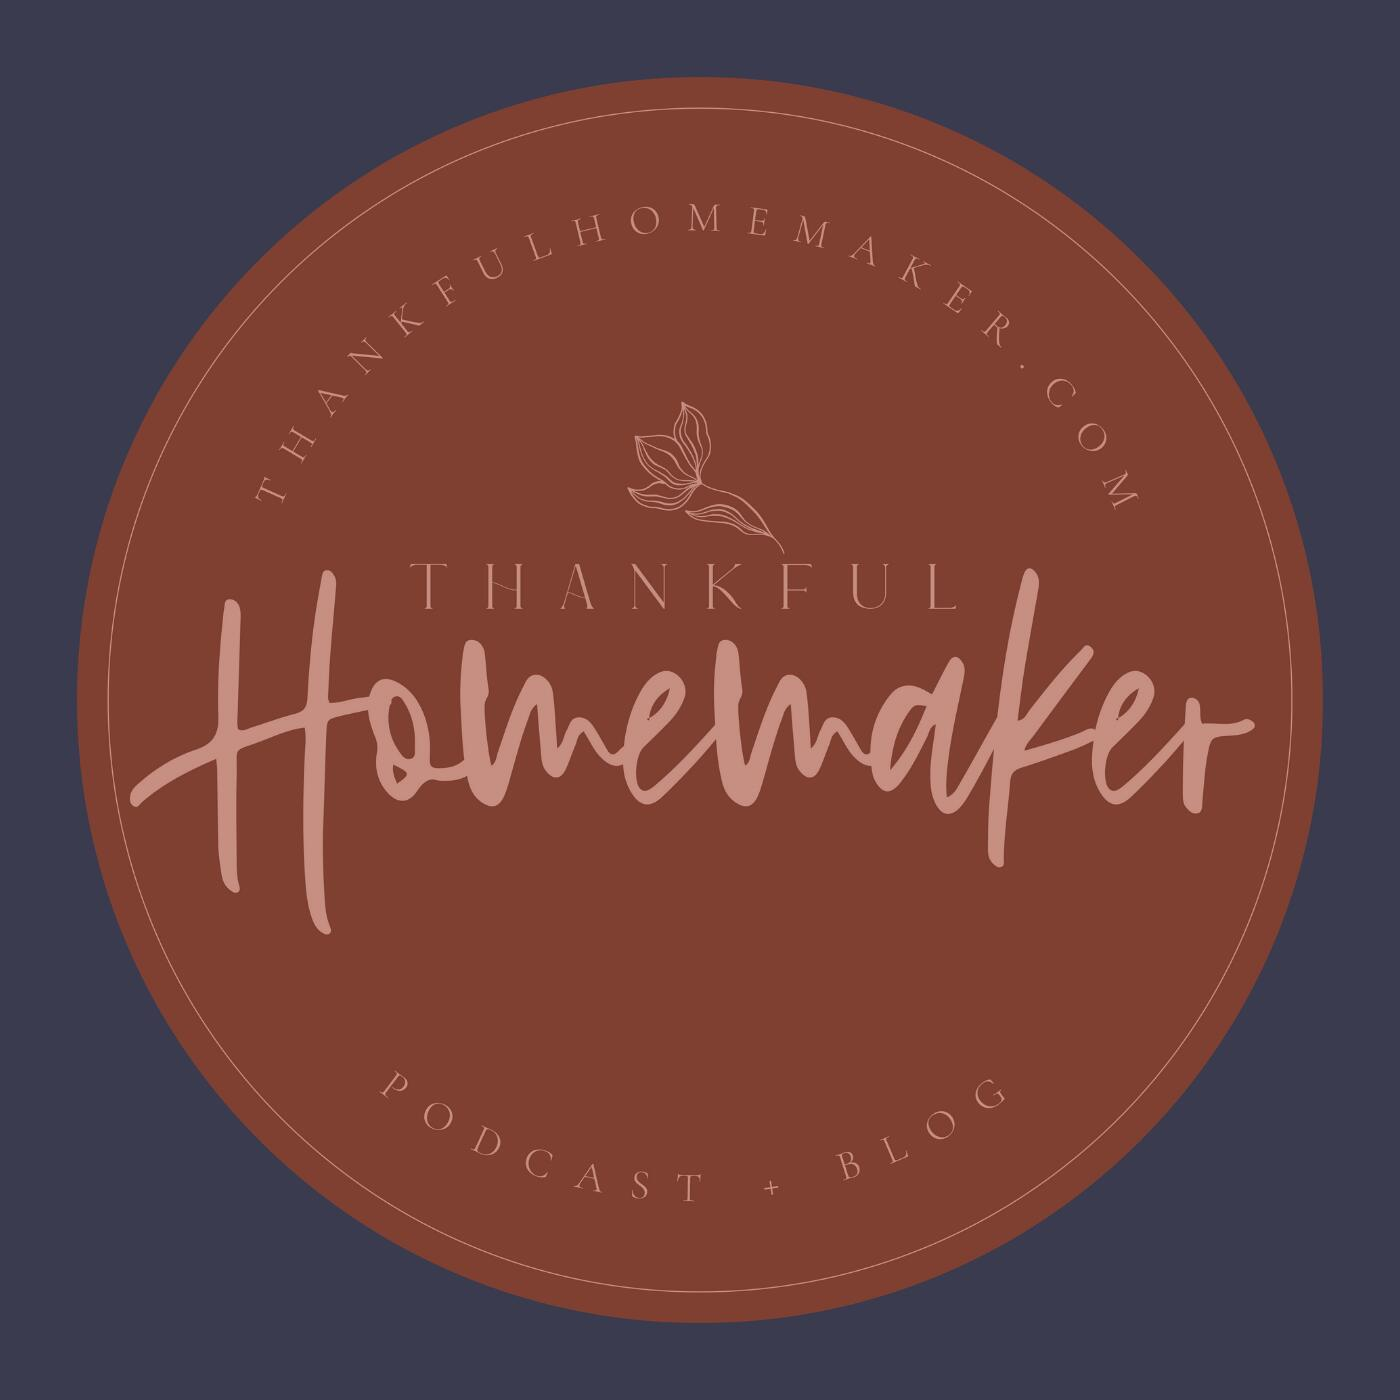 Thankful Homemaker: A Christian Homemaking Podcast